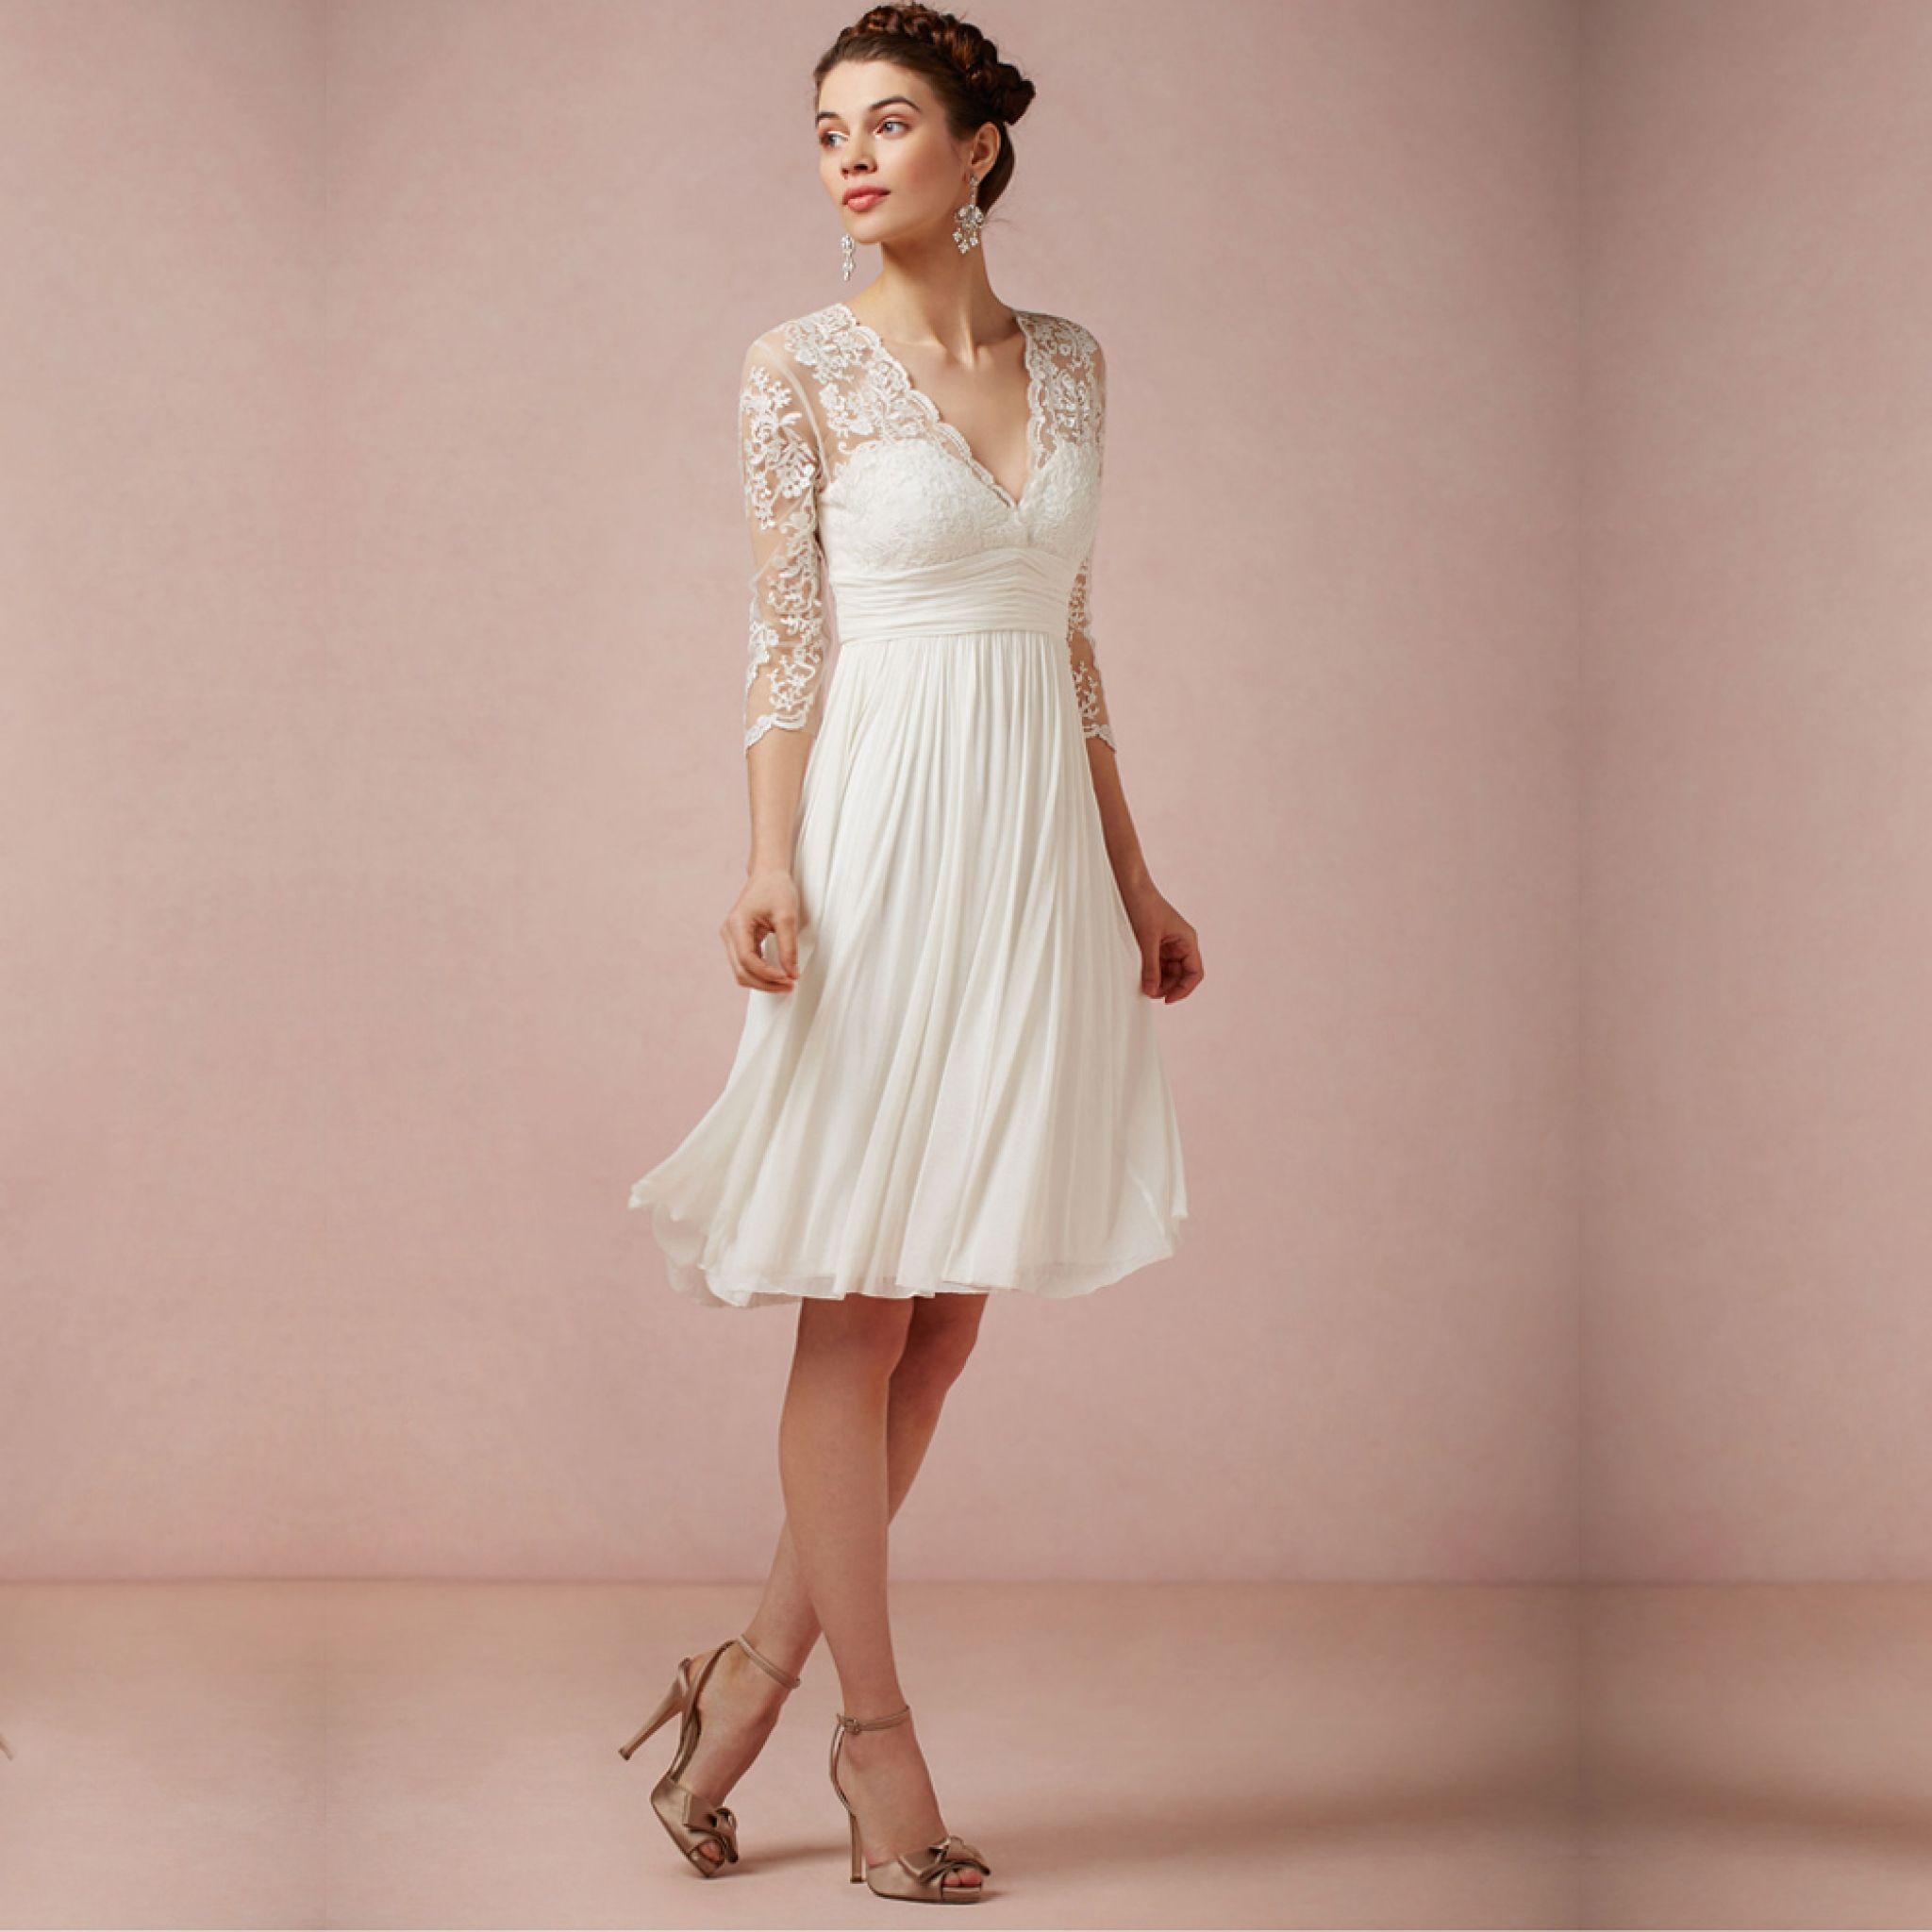 simple knee length wedding dresses - plus size dresses for wedding ...